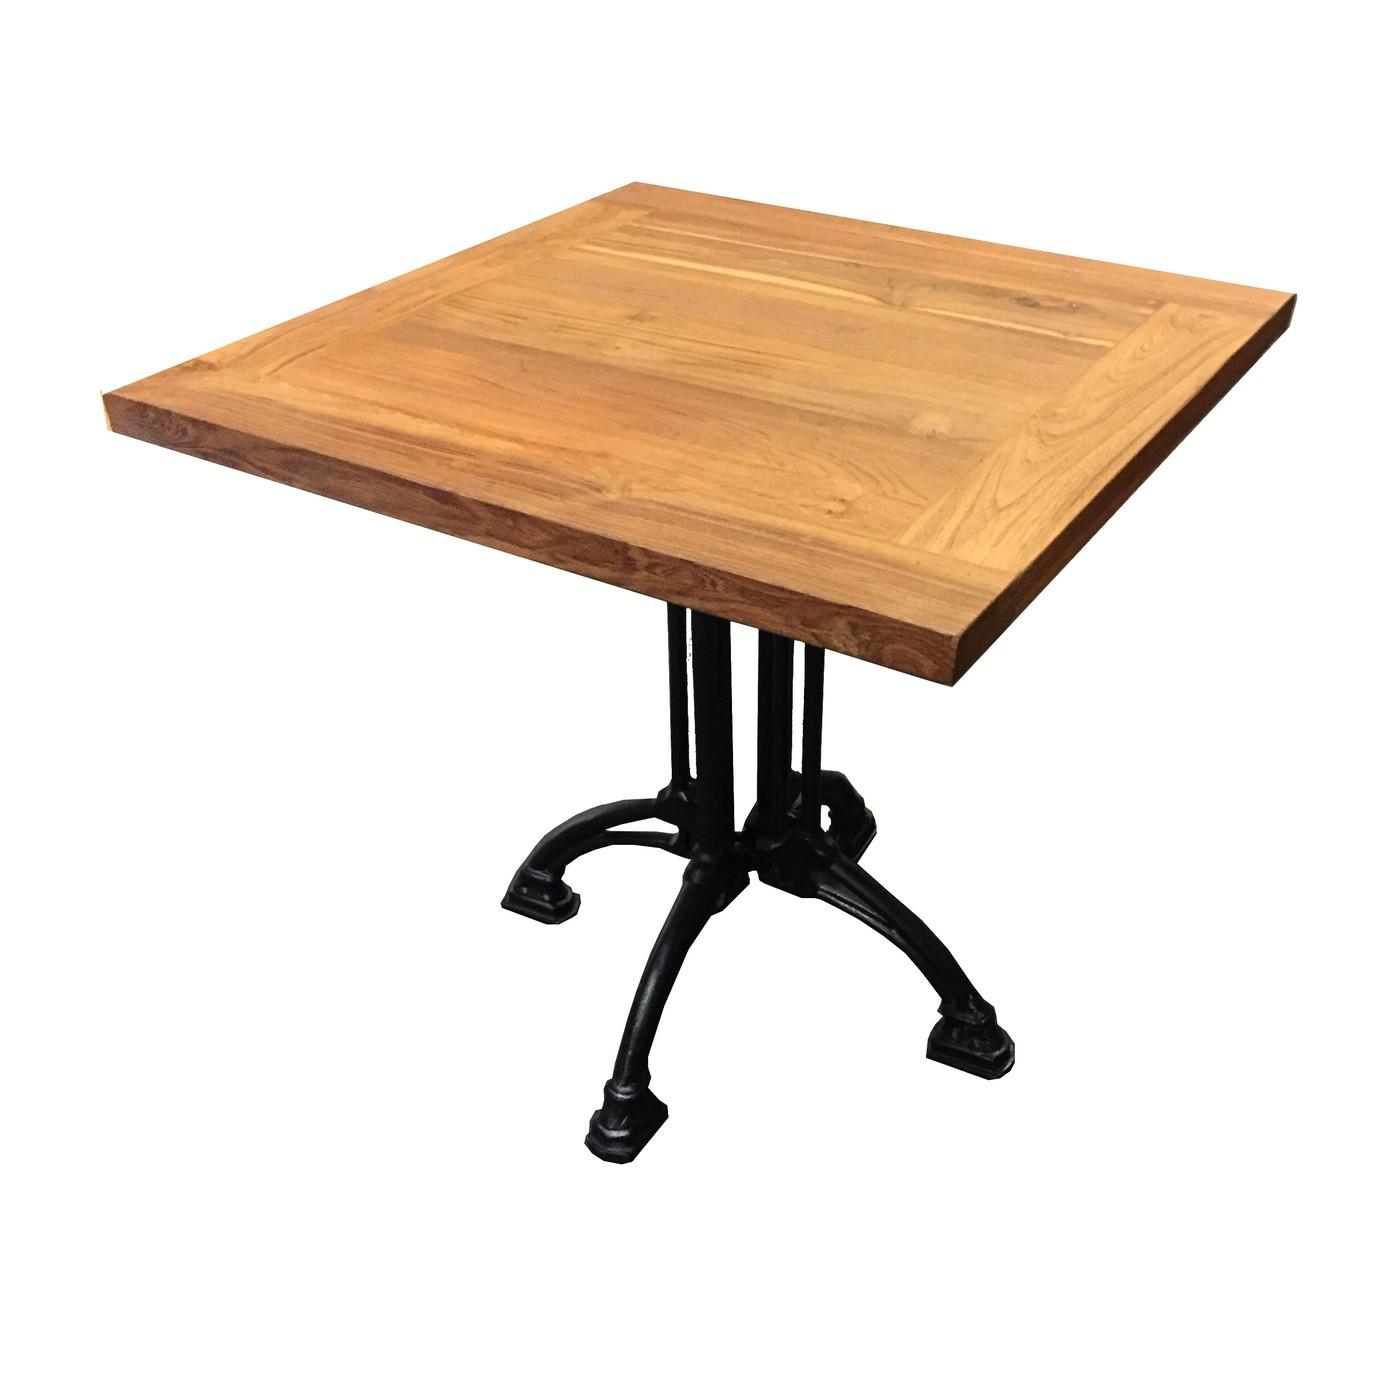 Table carree bois massif